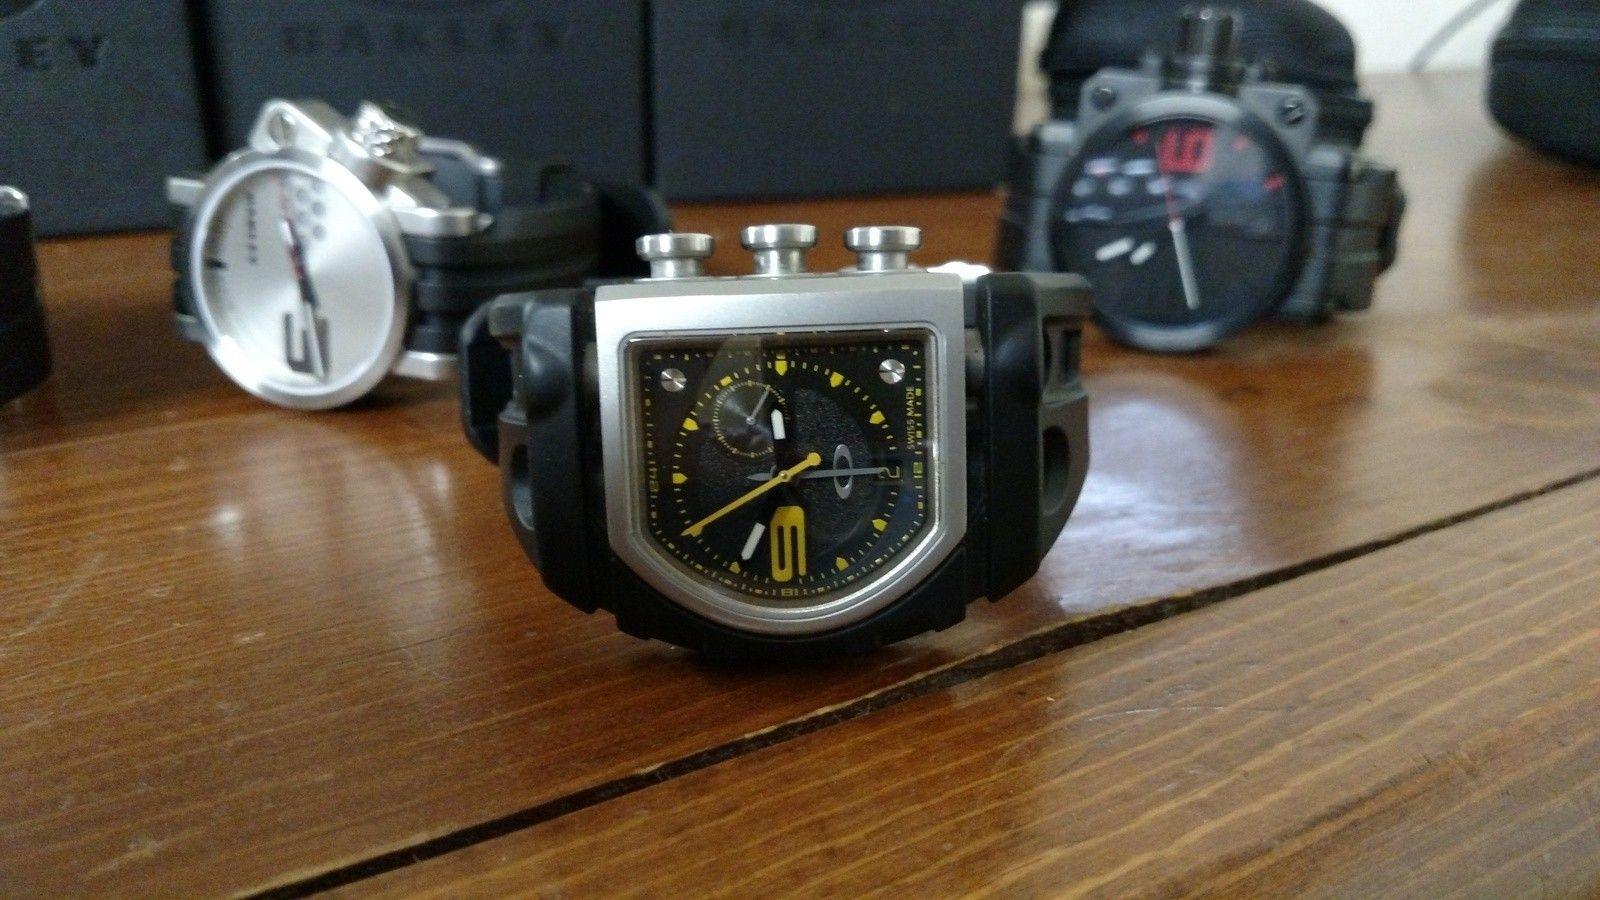 Lot of watches (cheap) - uploadfromtaptalk1446852010369.jpg